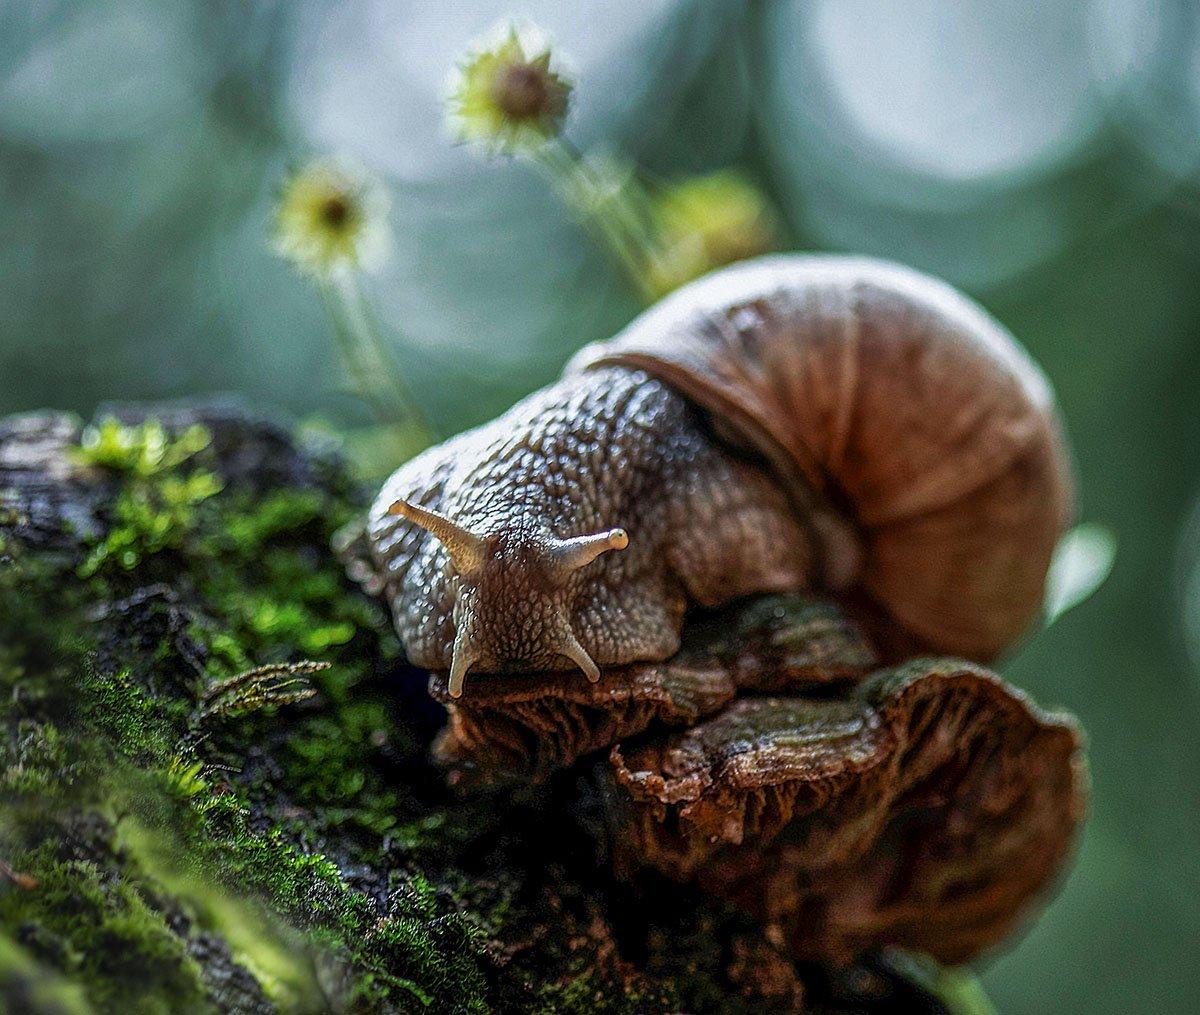 улитка, тихоход,лето,лес, природа, snail, cochlea, mystery, summer, forest, nature, Стукалова Юлия